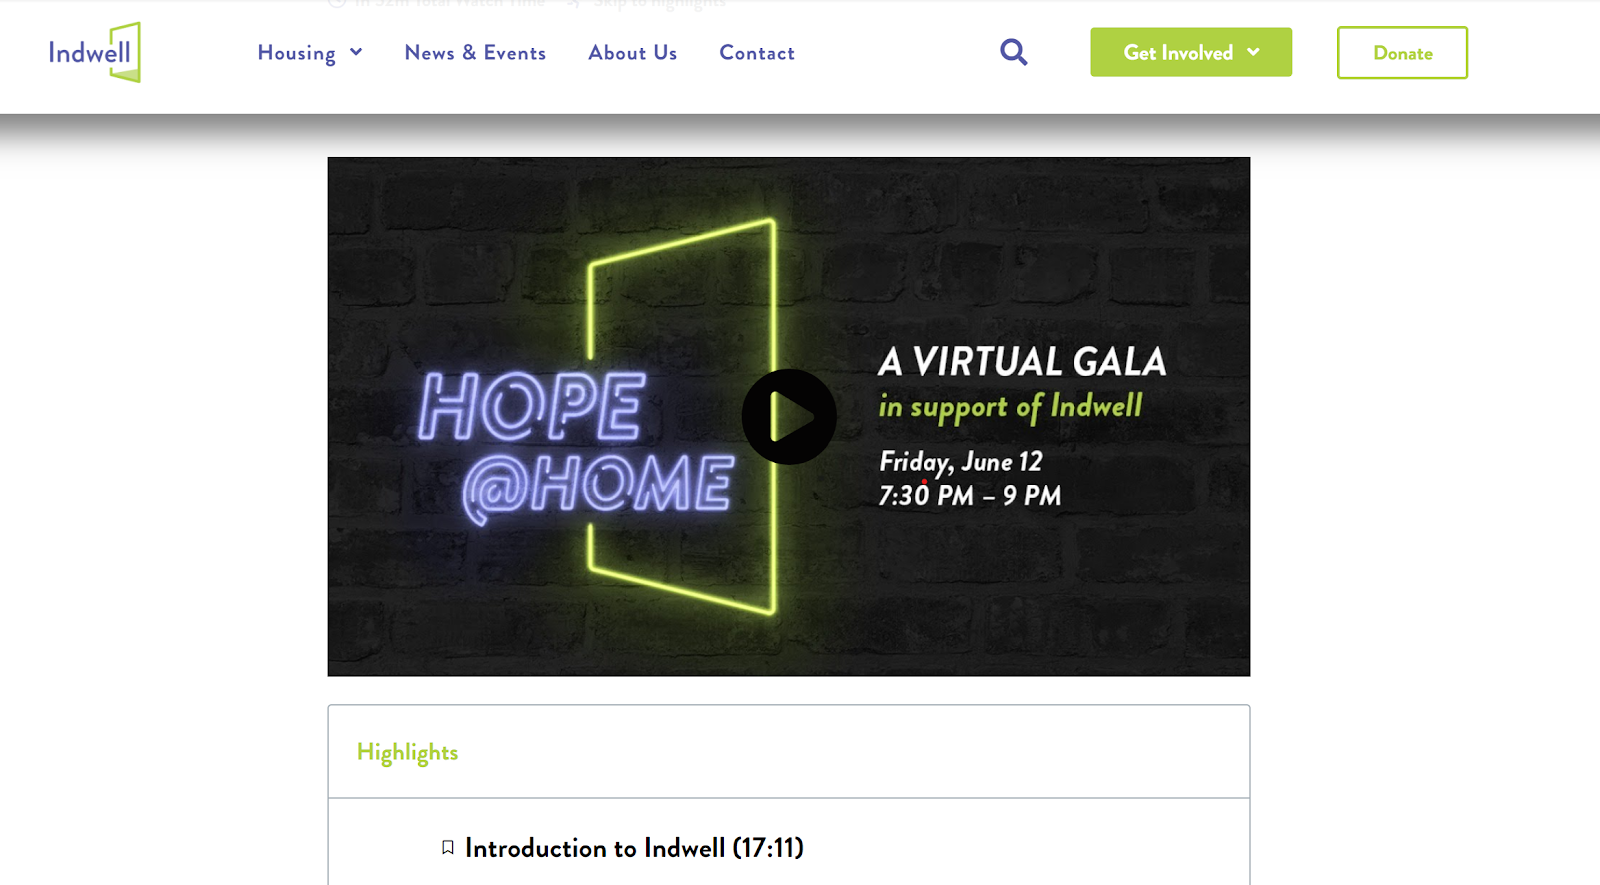 Indwell Virtual Gala landing page